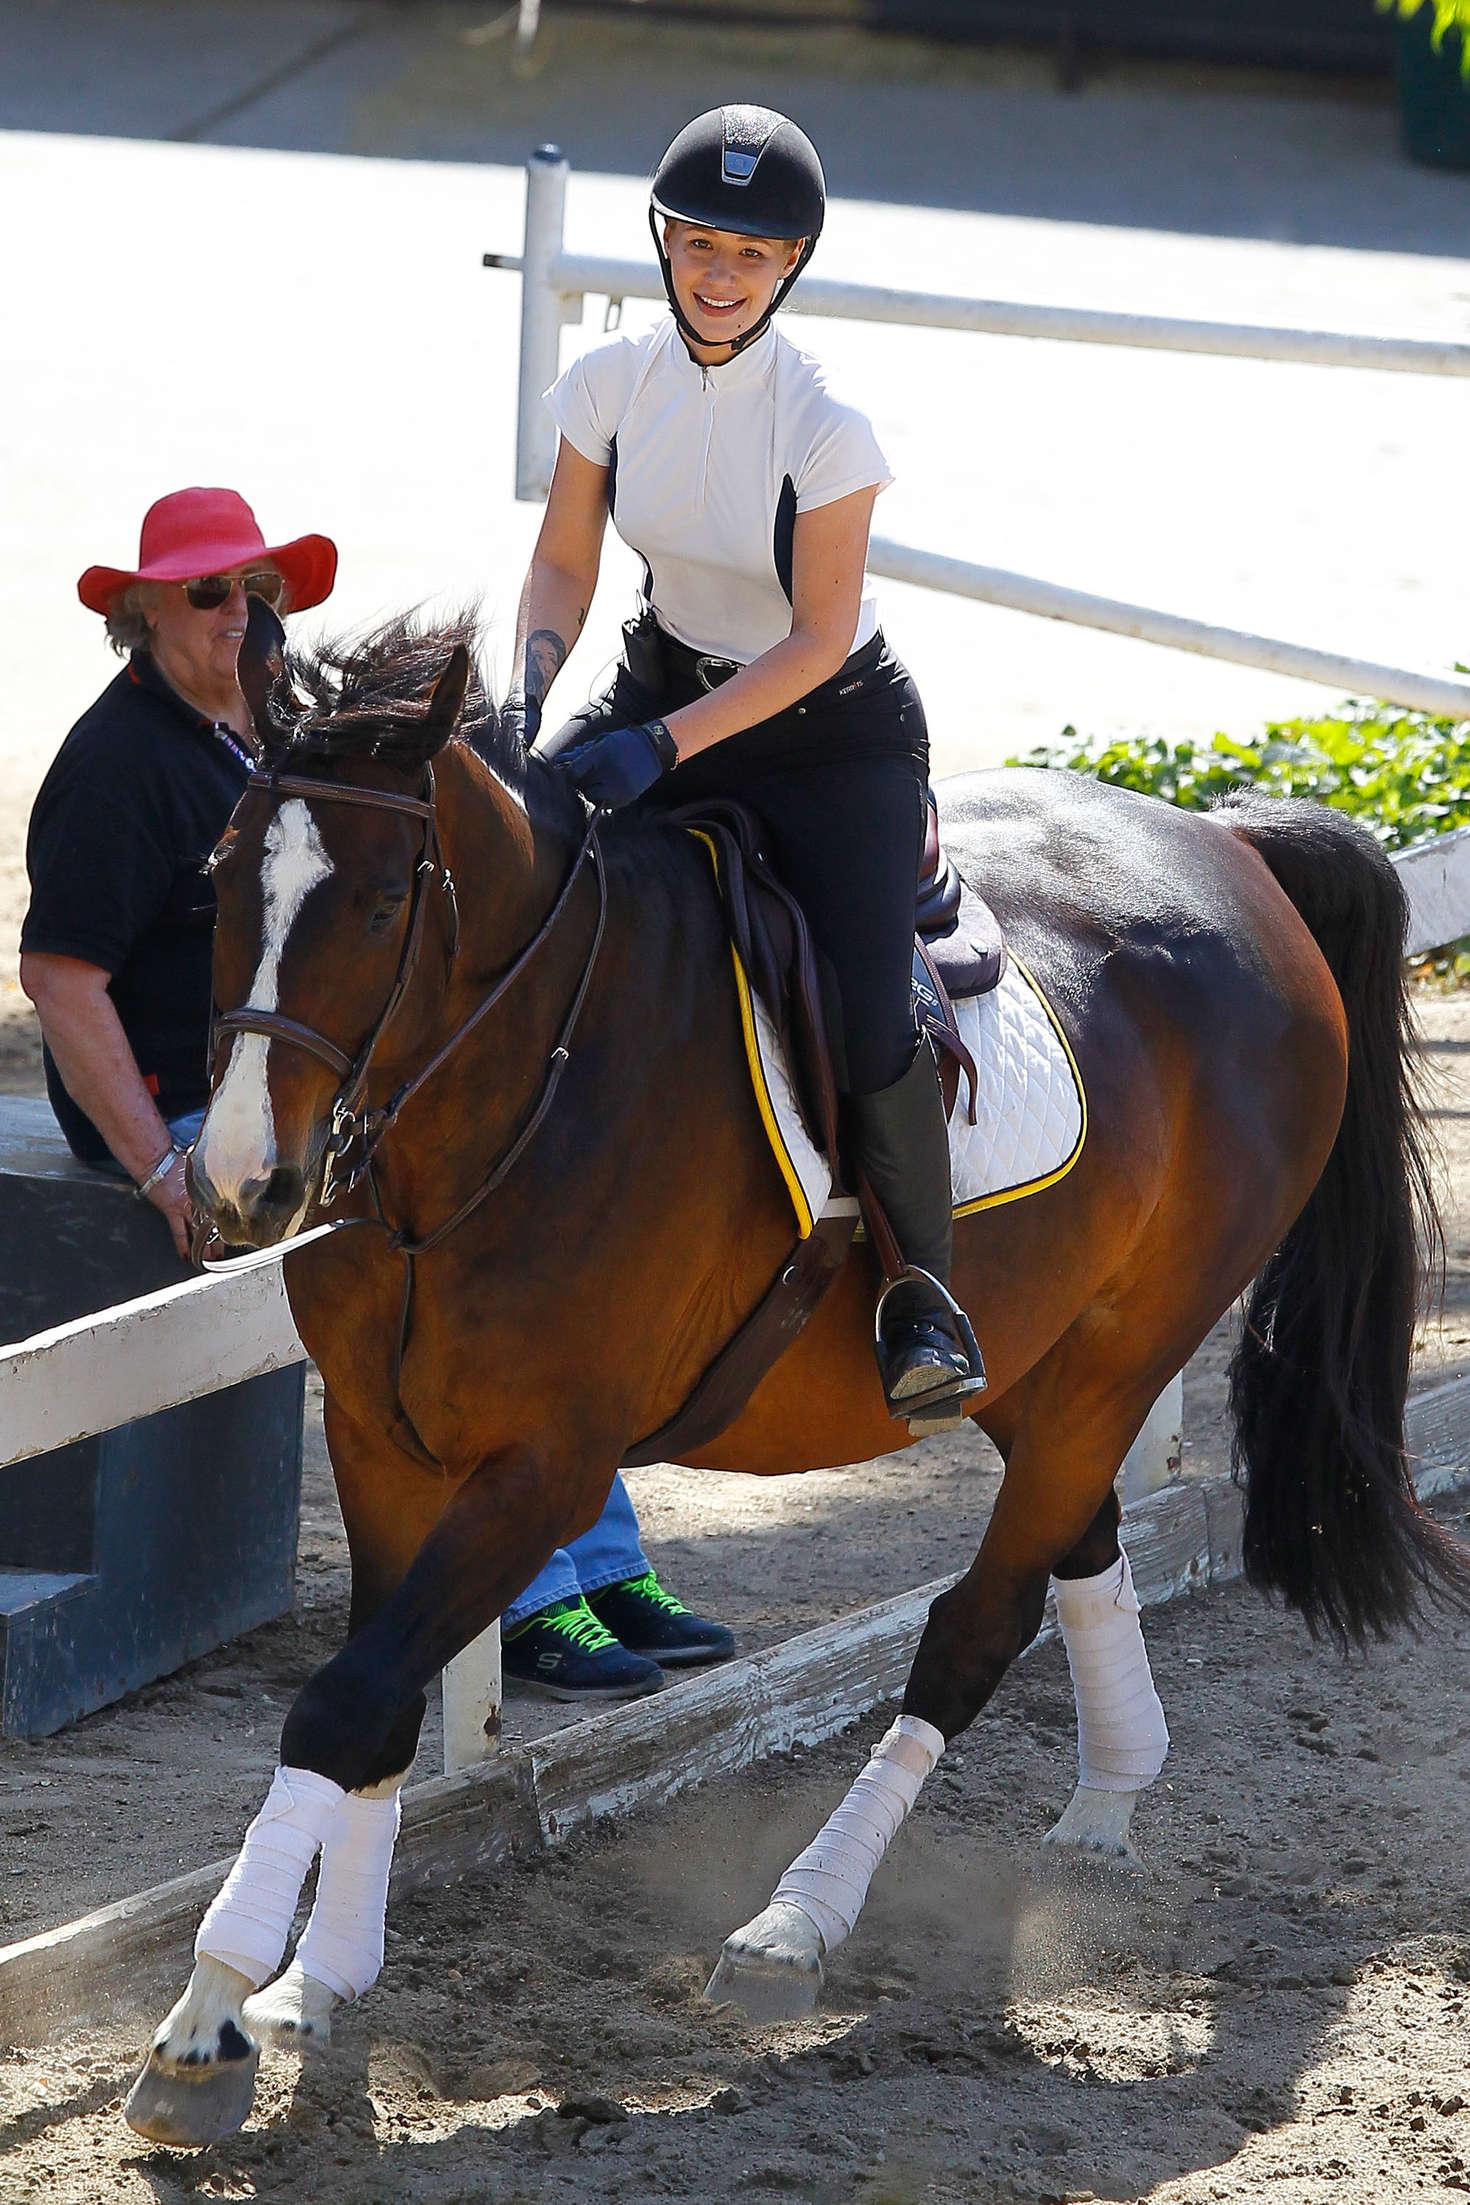 Iggy Azalea Horse Riding In Los Angeles Indian Girls